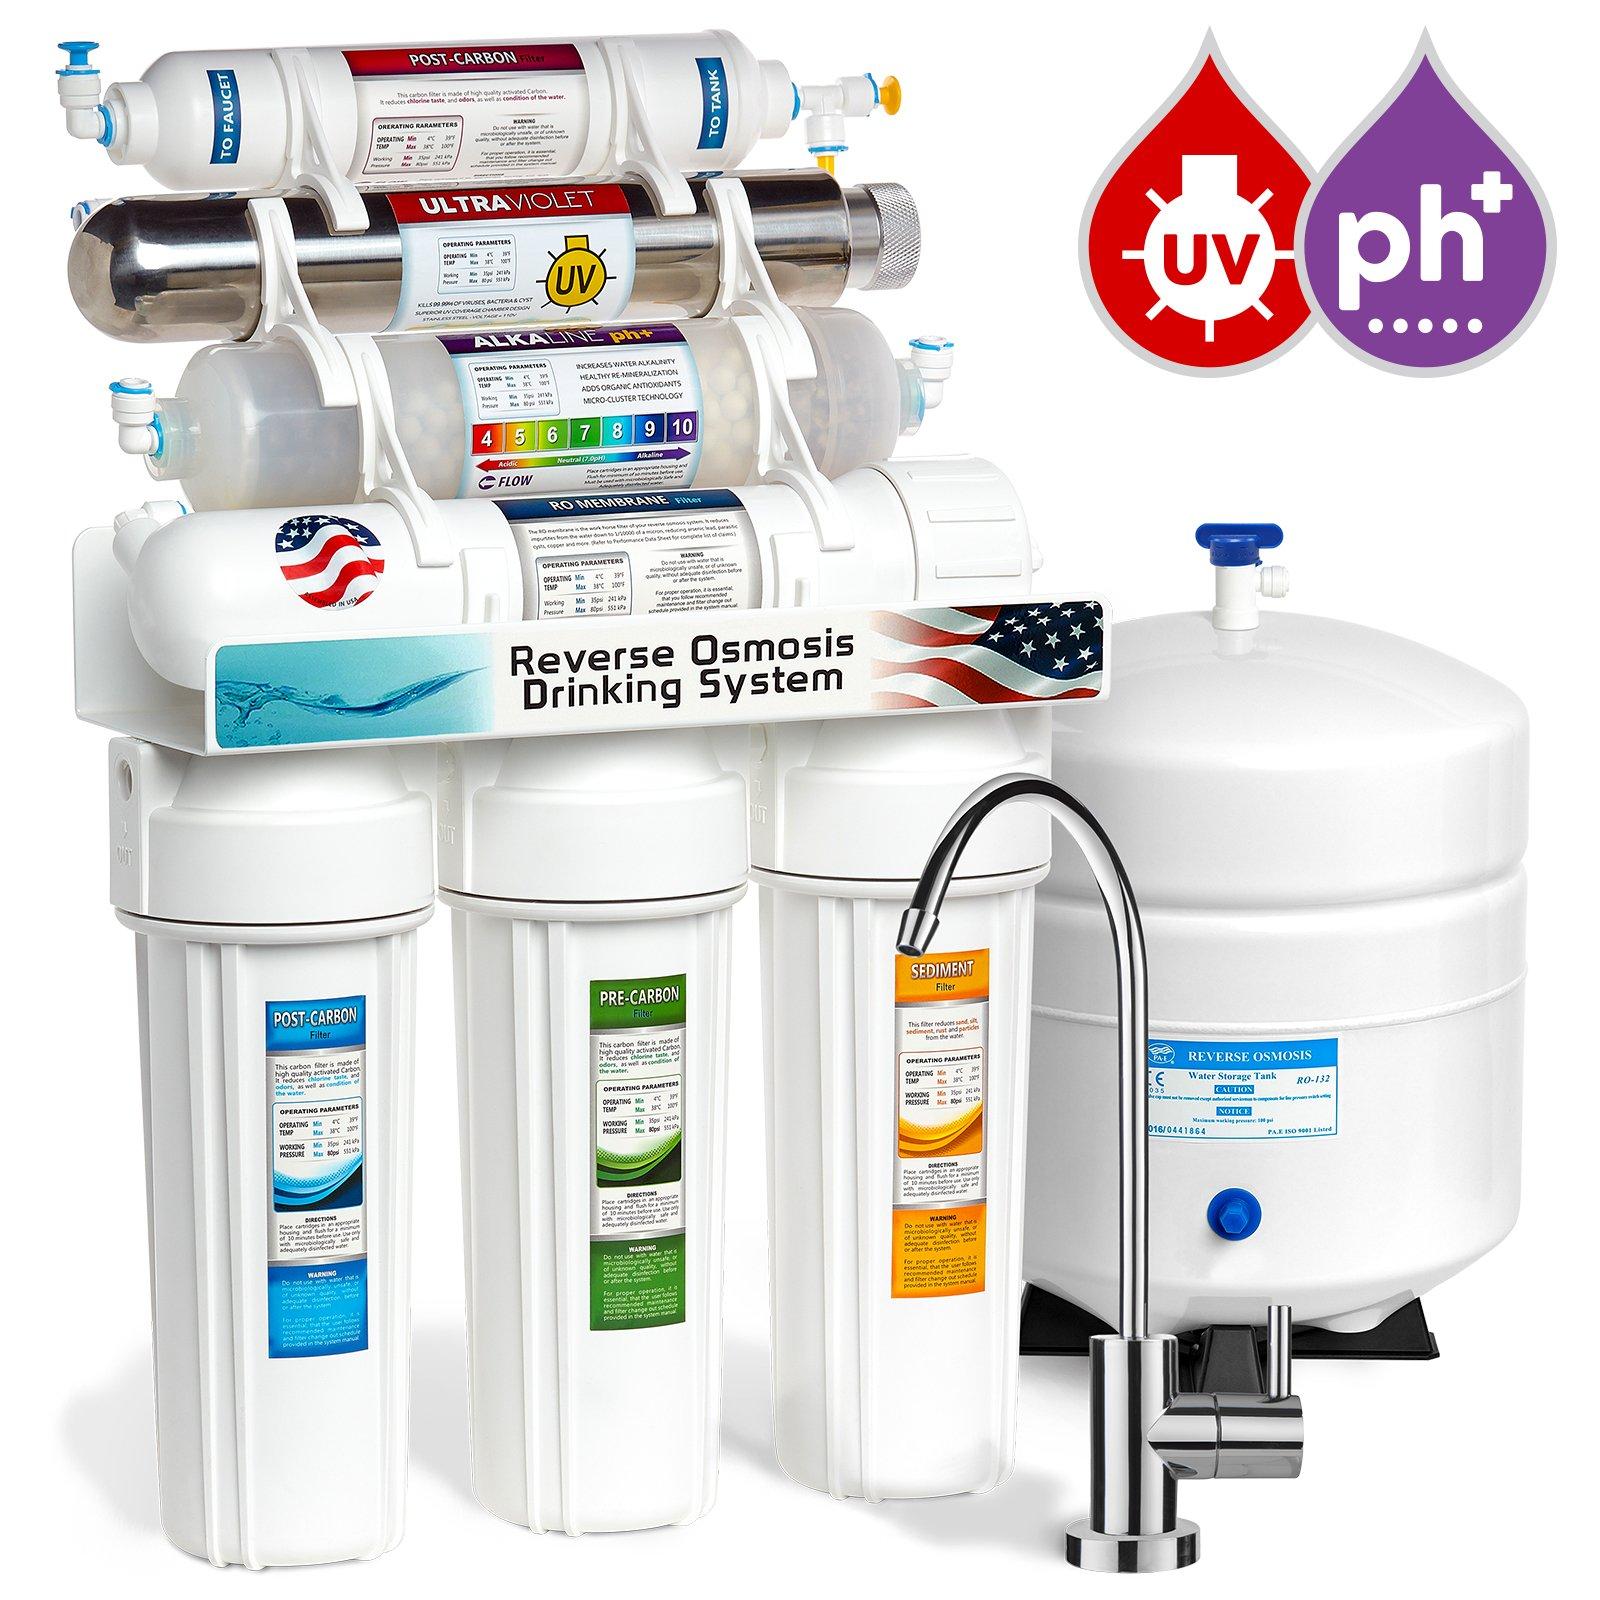 Express Water ROALKUV10M  11 Stage UV Ultraviolet + Alkaline + Reverse Osmosis Home Drinking Water Filtration System 100 GPD RO Membrane Filter - Modern Faucet, BPA Free